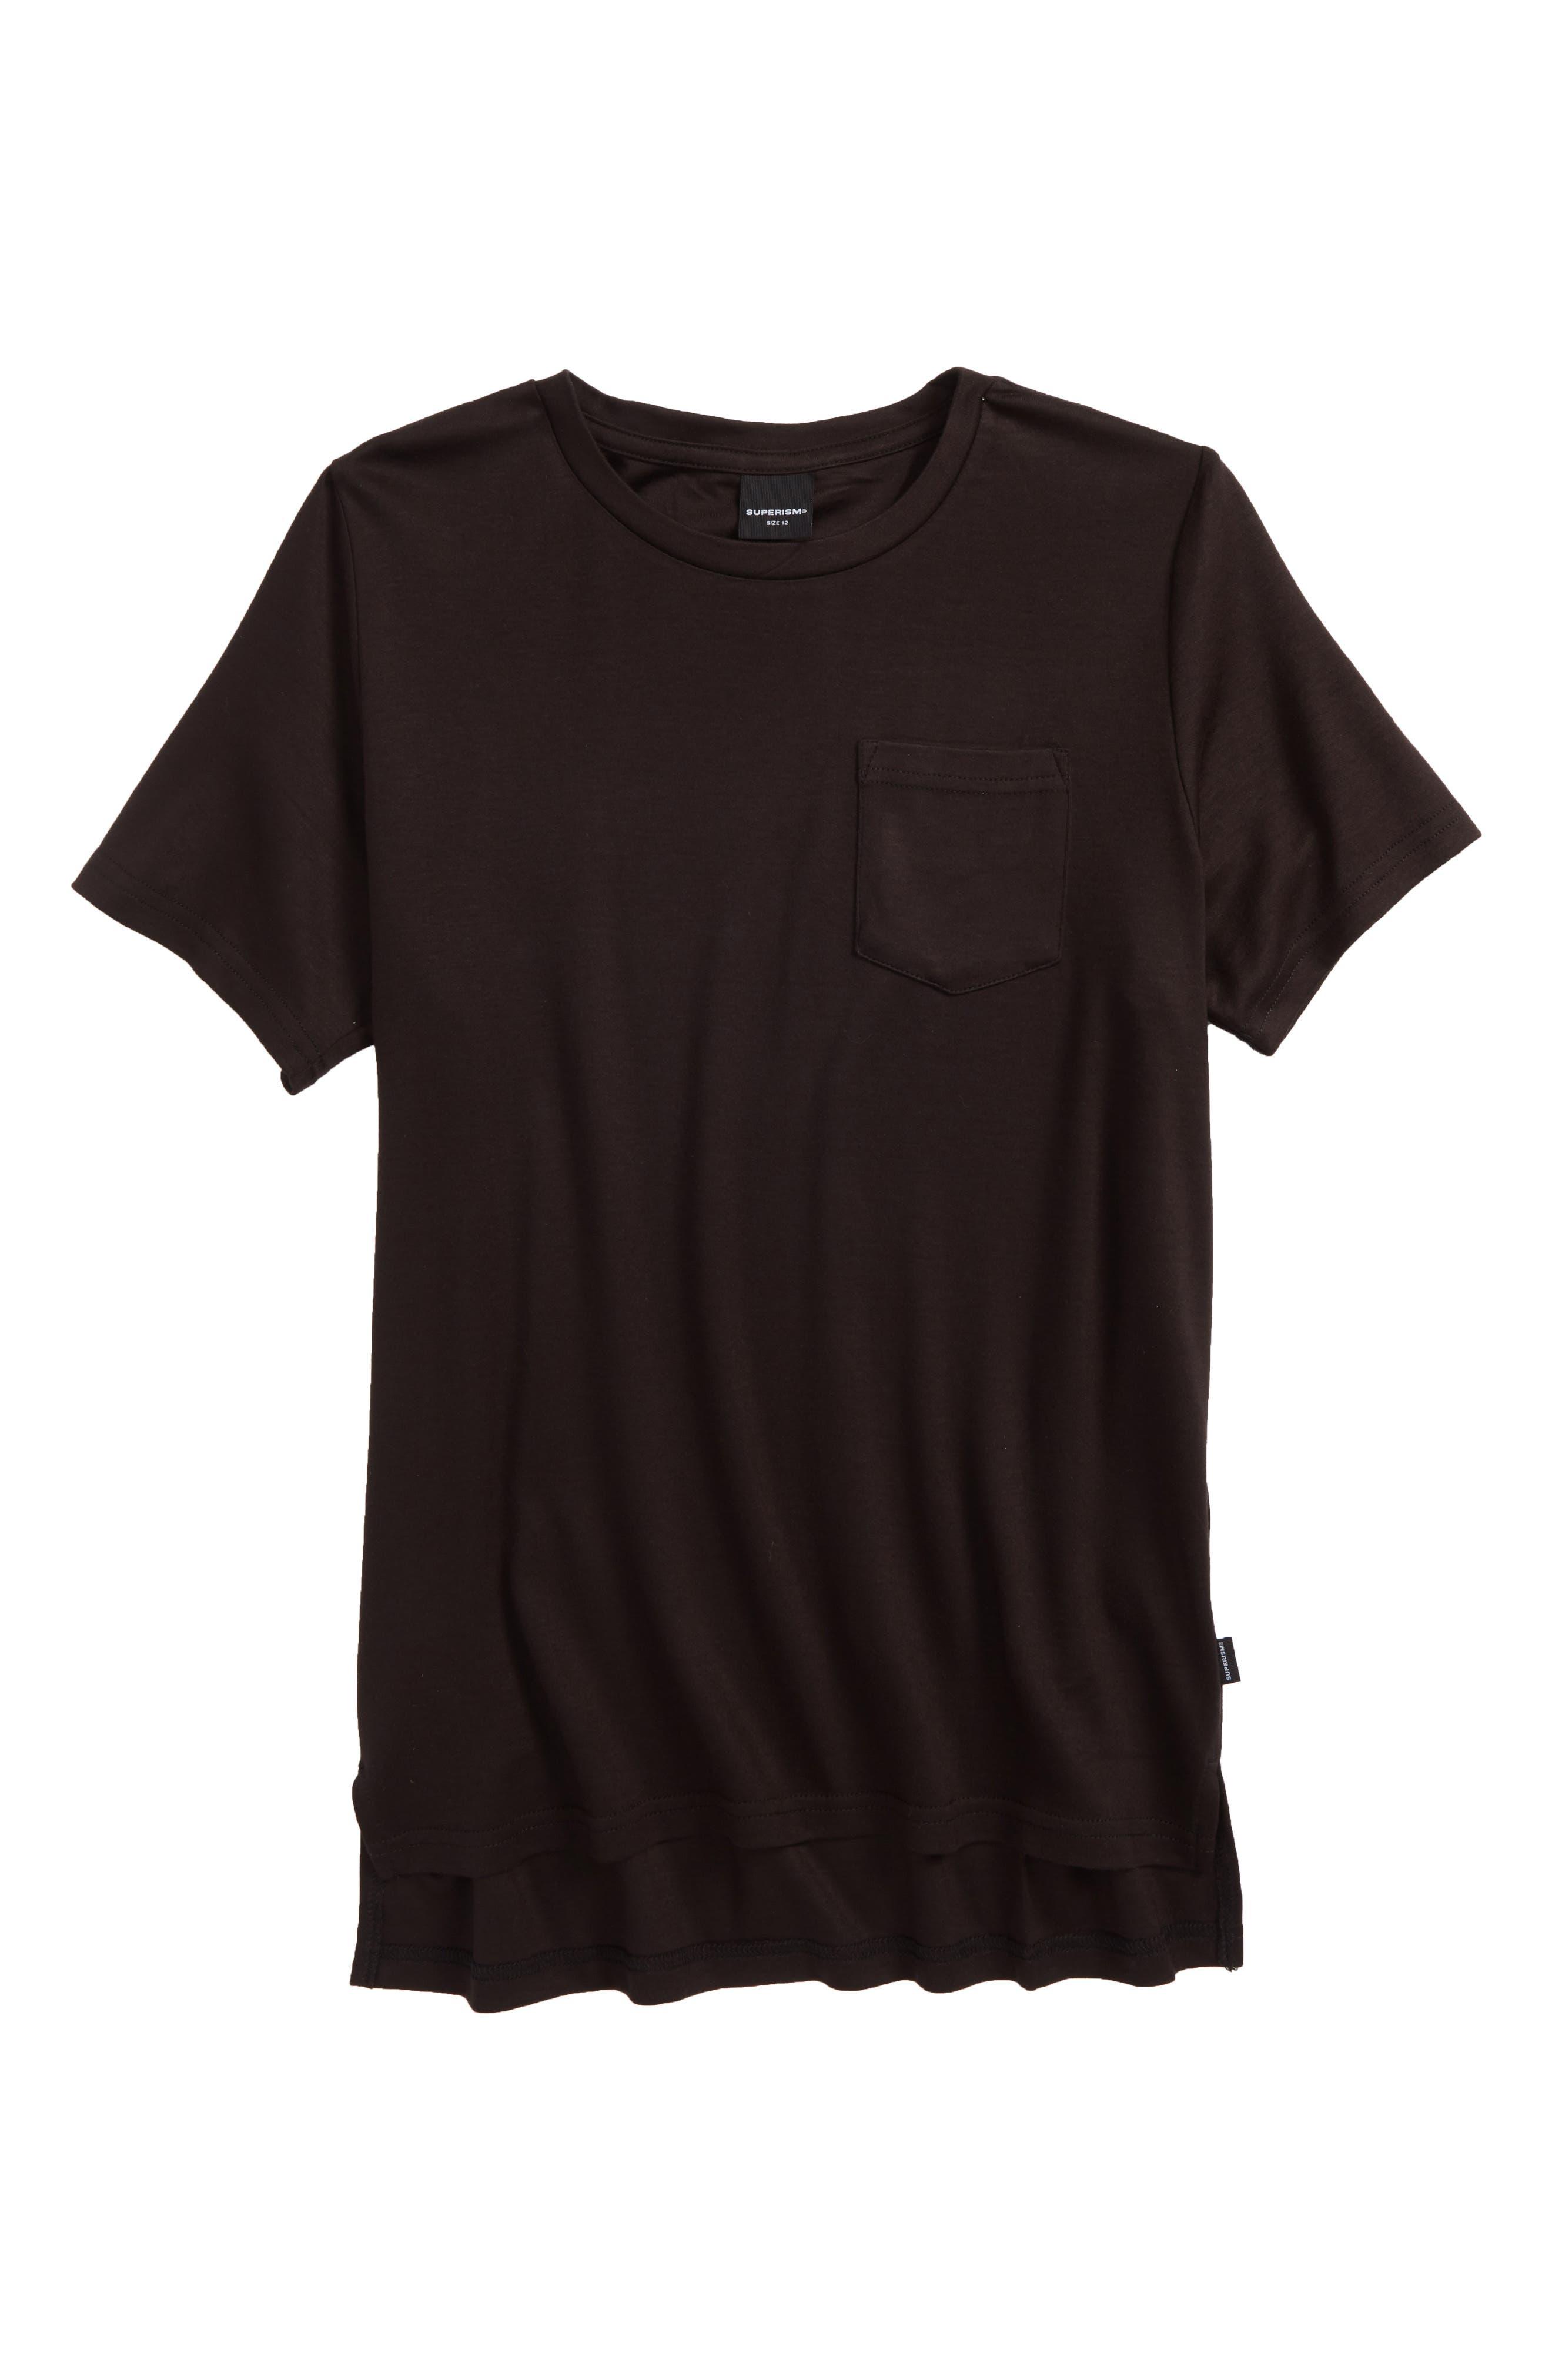 Brycen T-Shirt,                         Main,                         color, 001